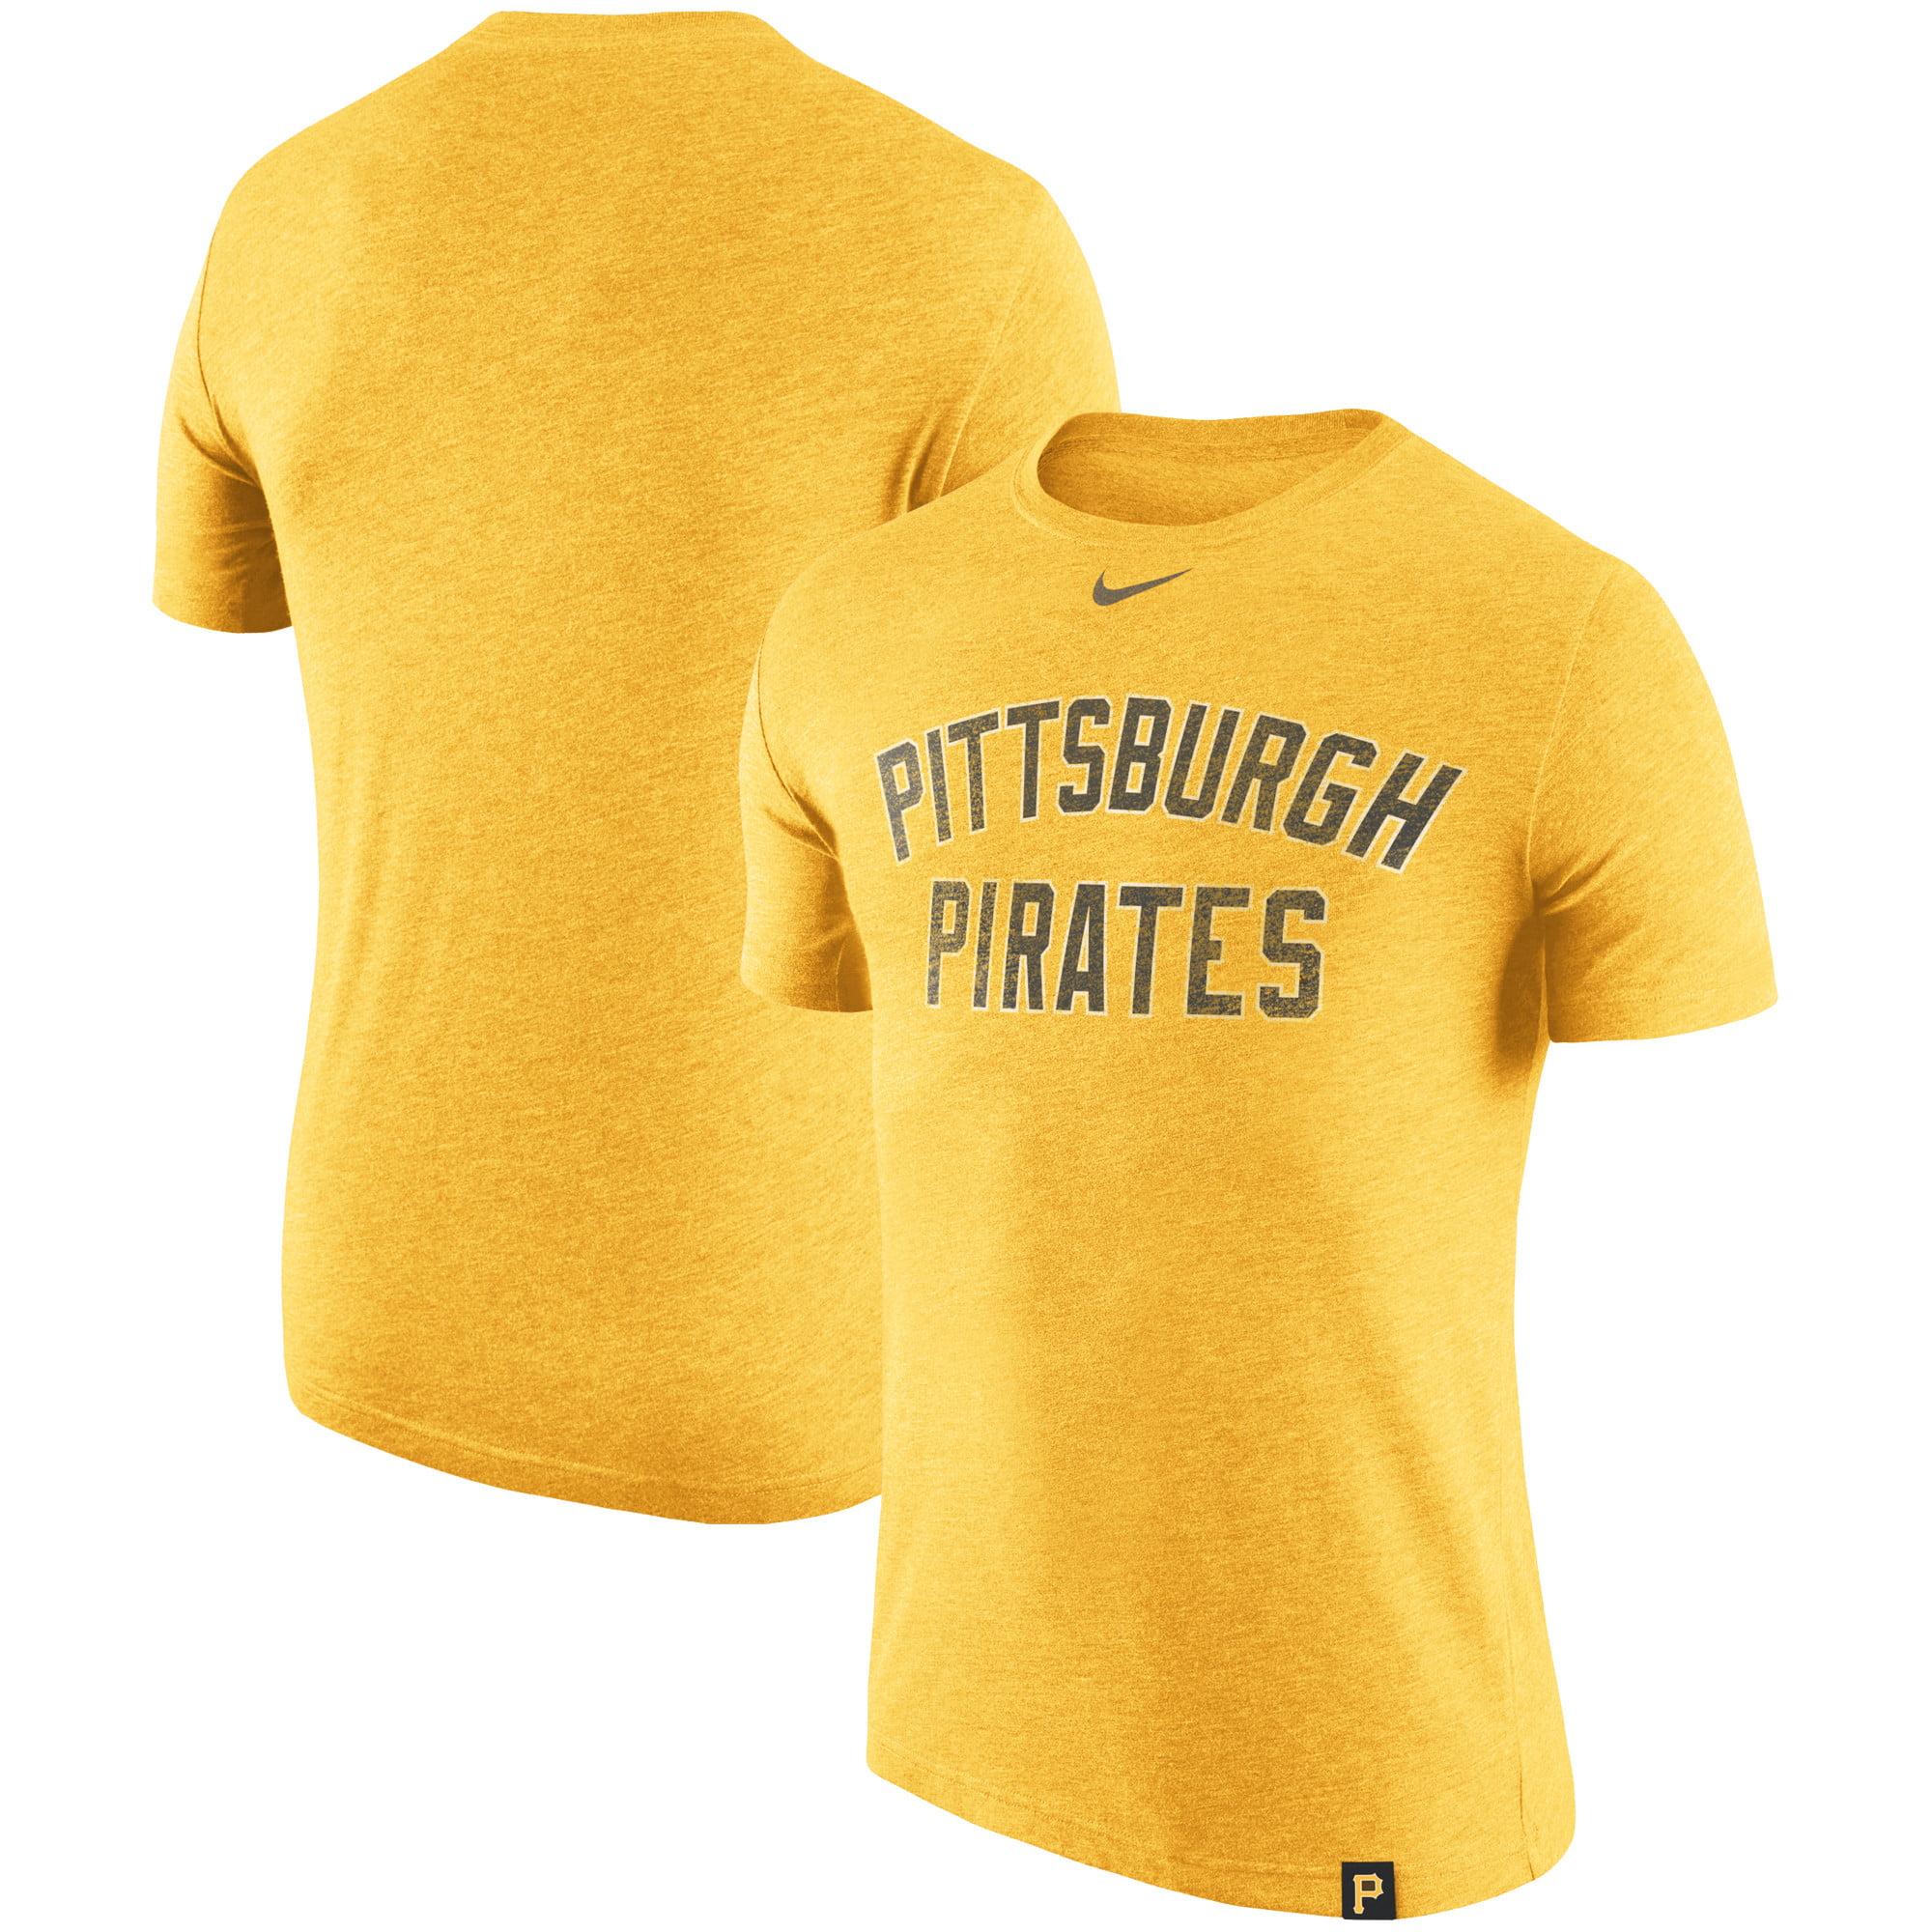 Pittsburgh Pirates Nike Tri-Blend DNA Performance T-Shirt - Heathered Gold